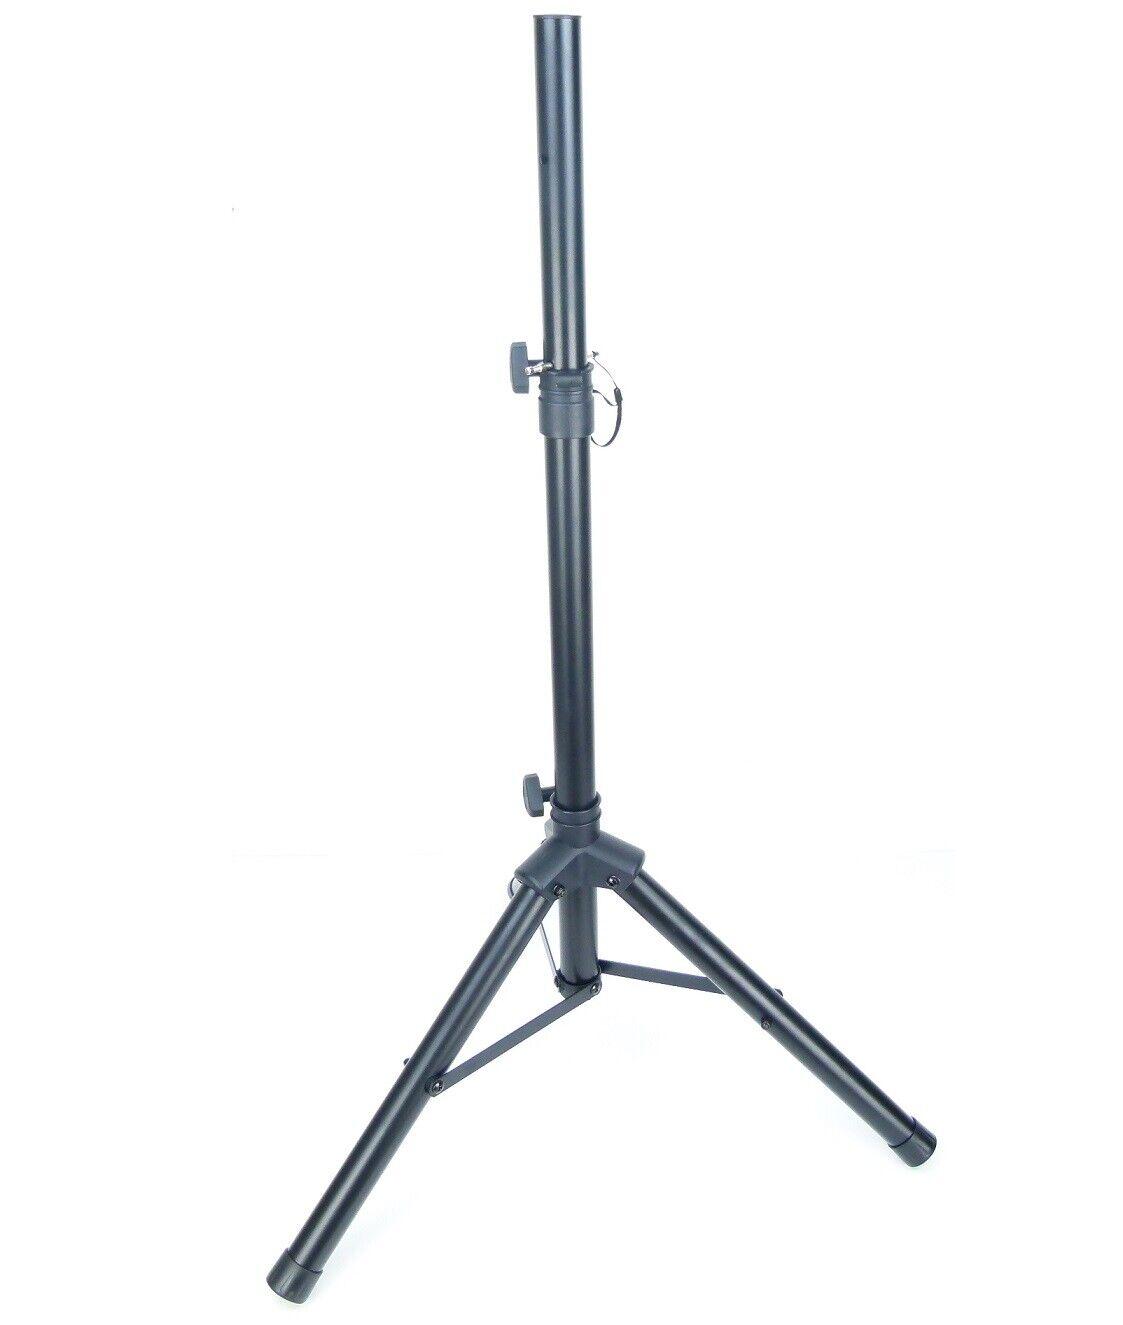 1,32m/25kg Boxing Tripod Speaker Stand Boxing High Stand Speaker Stand Tripod